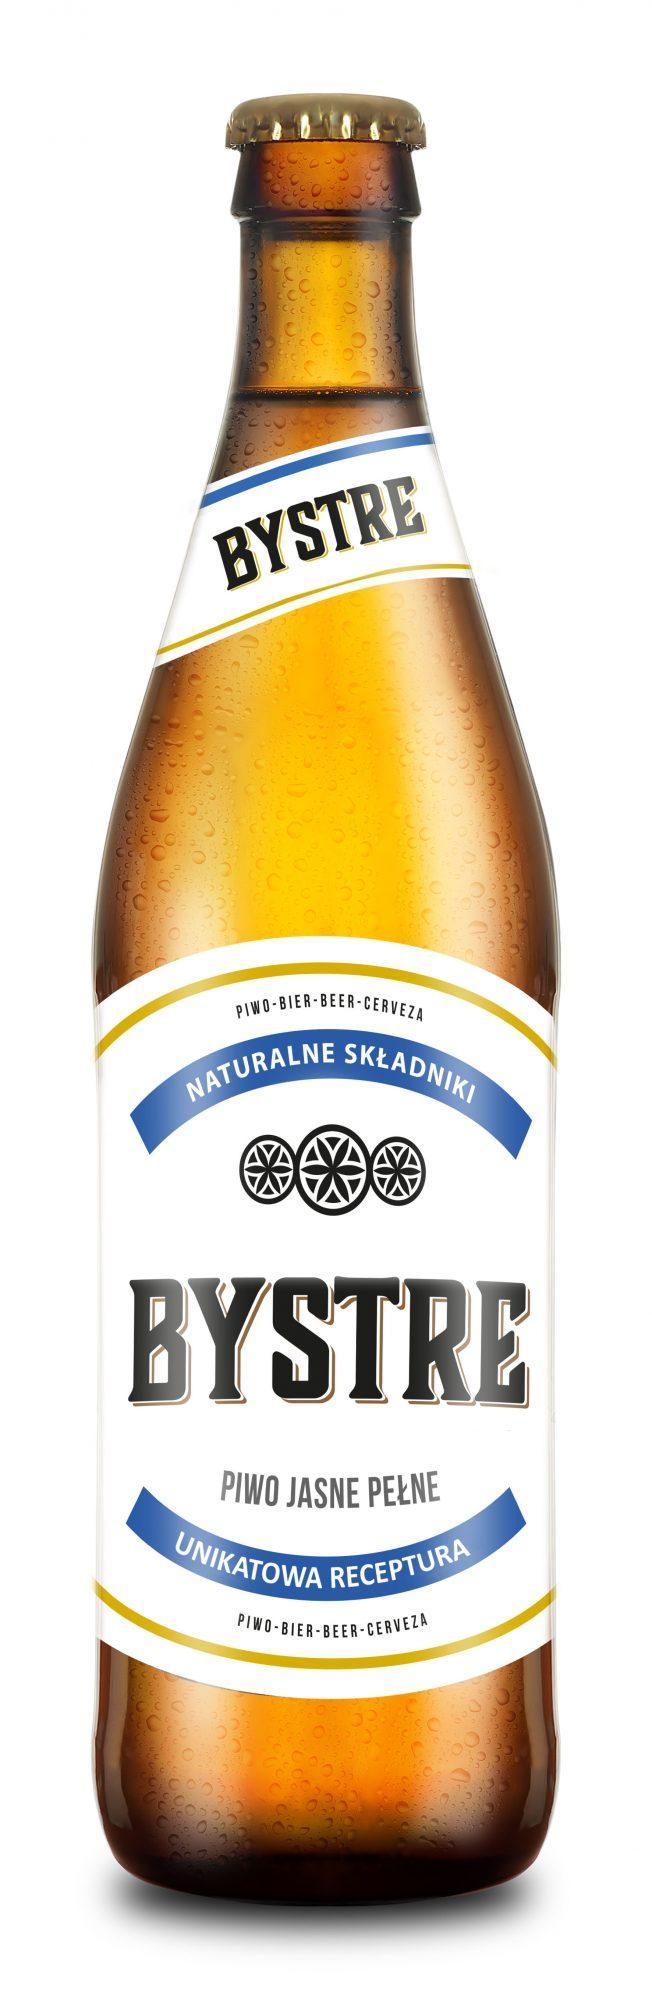 Piwo Bystre - bystre wiz